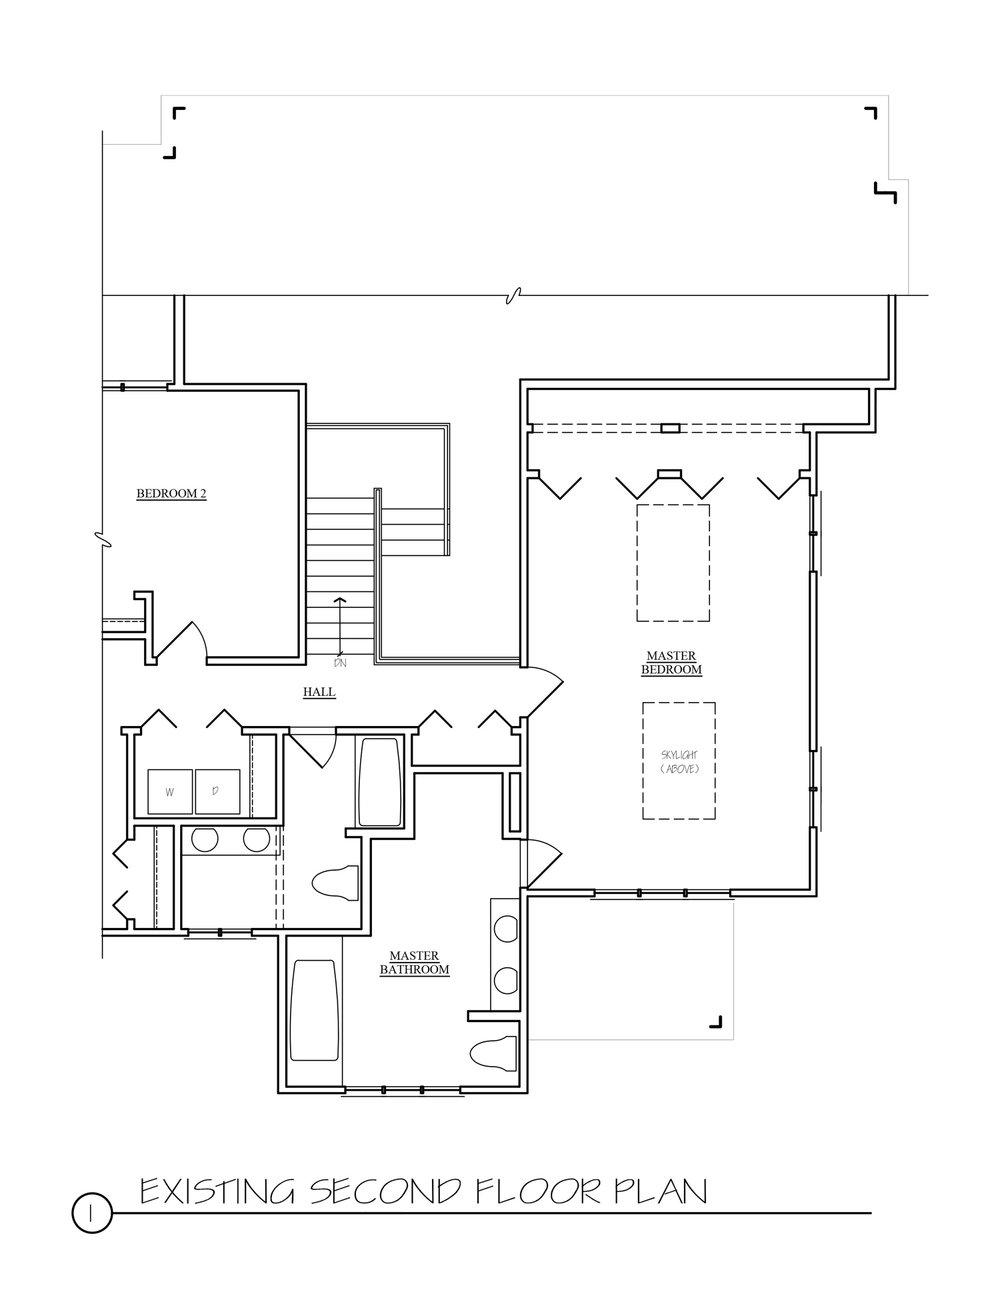 5_Existing-Second-Floor-Plan.jpg